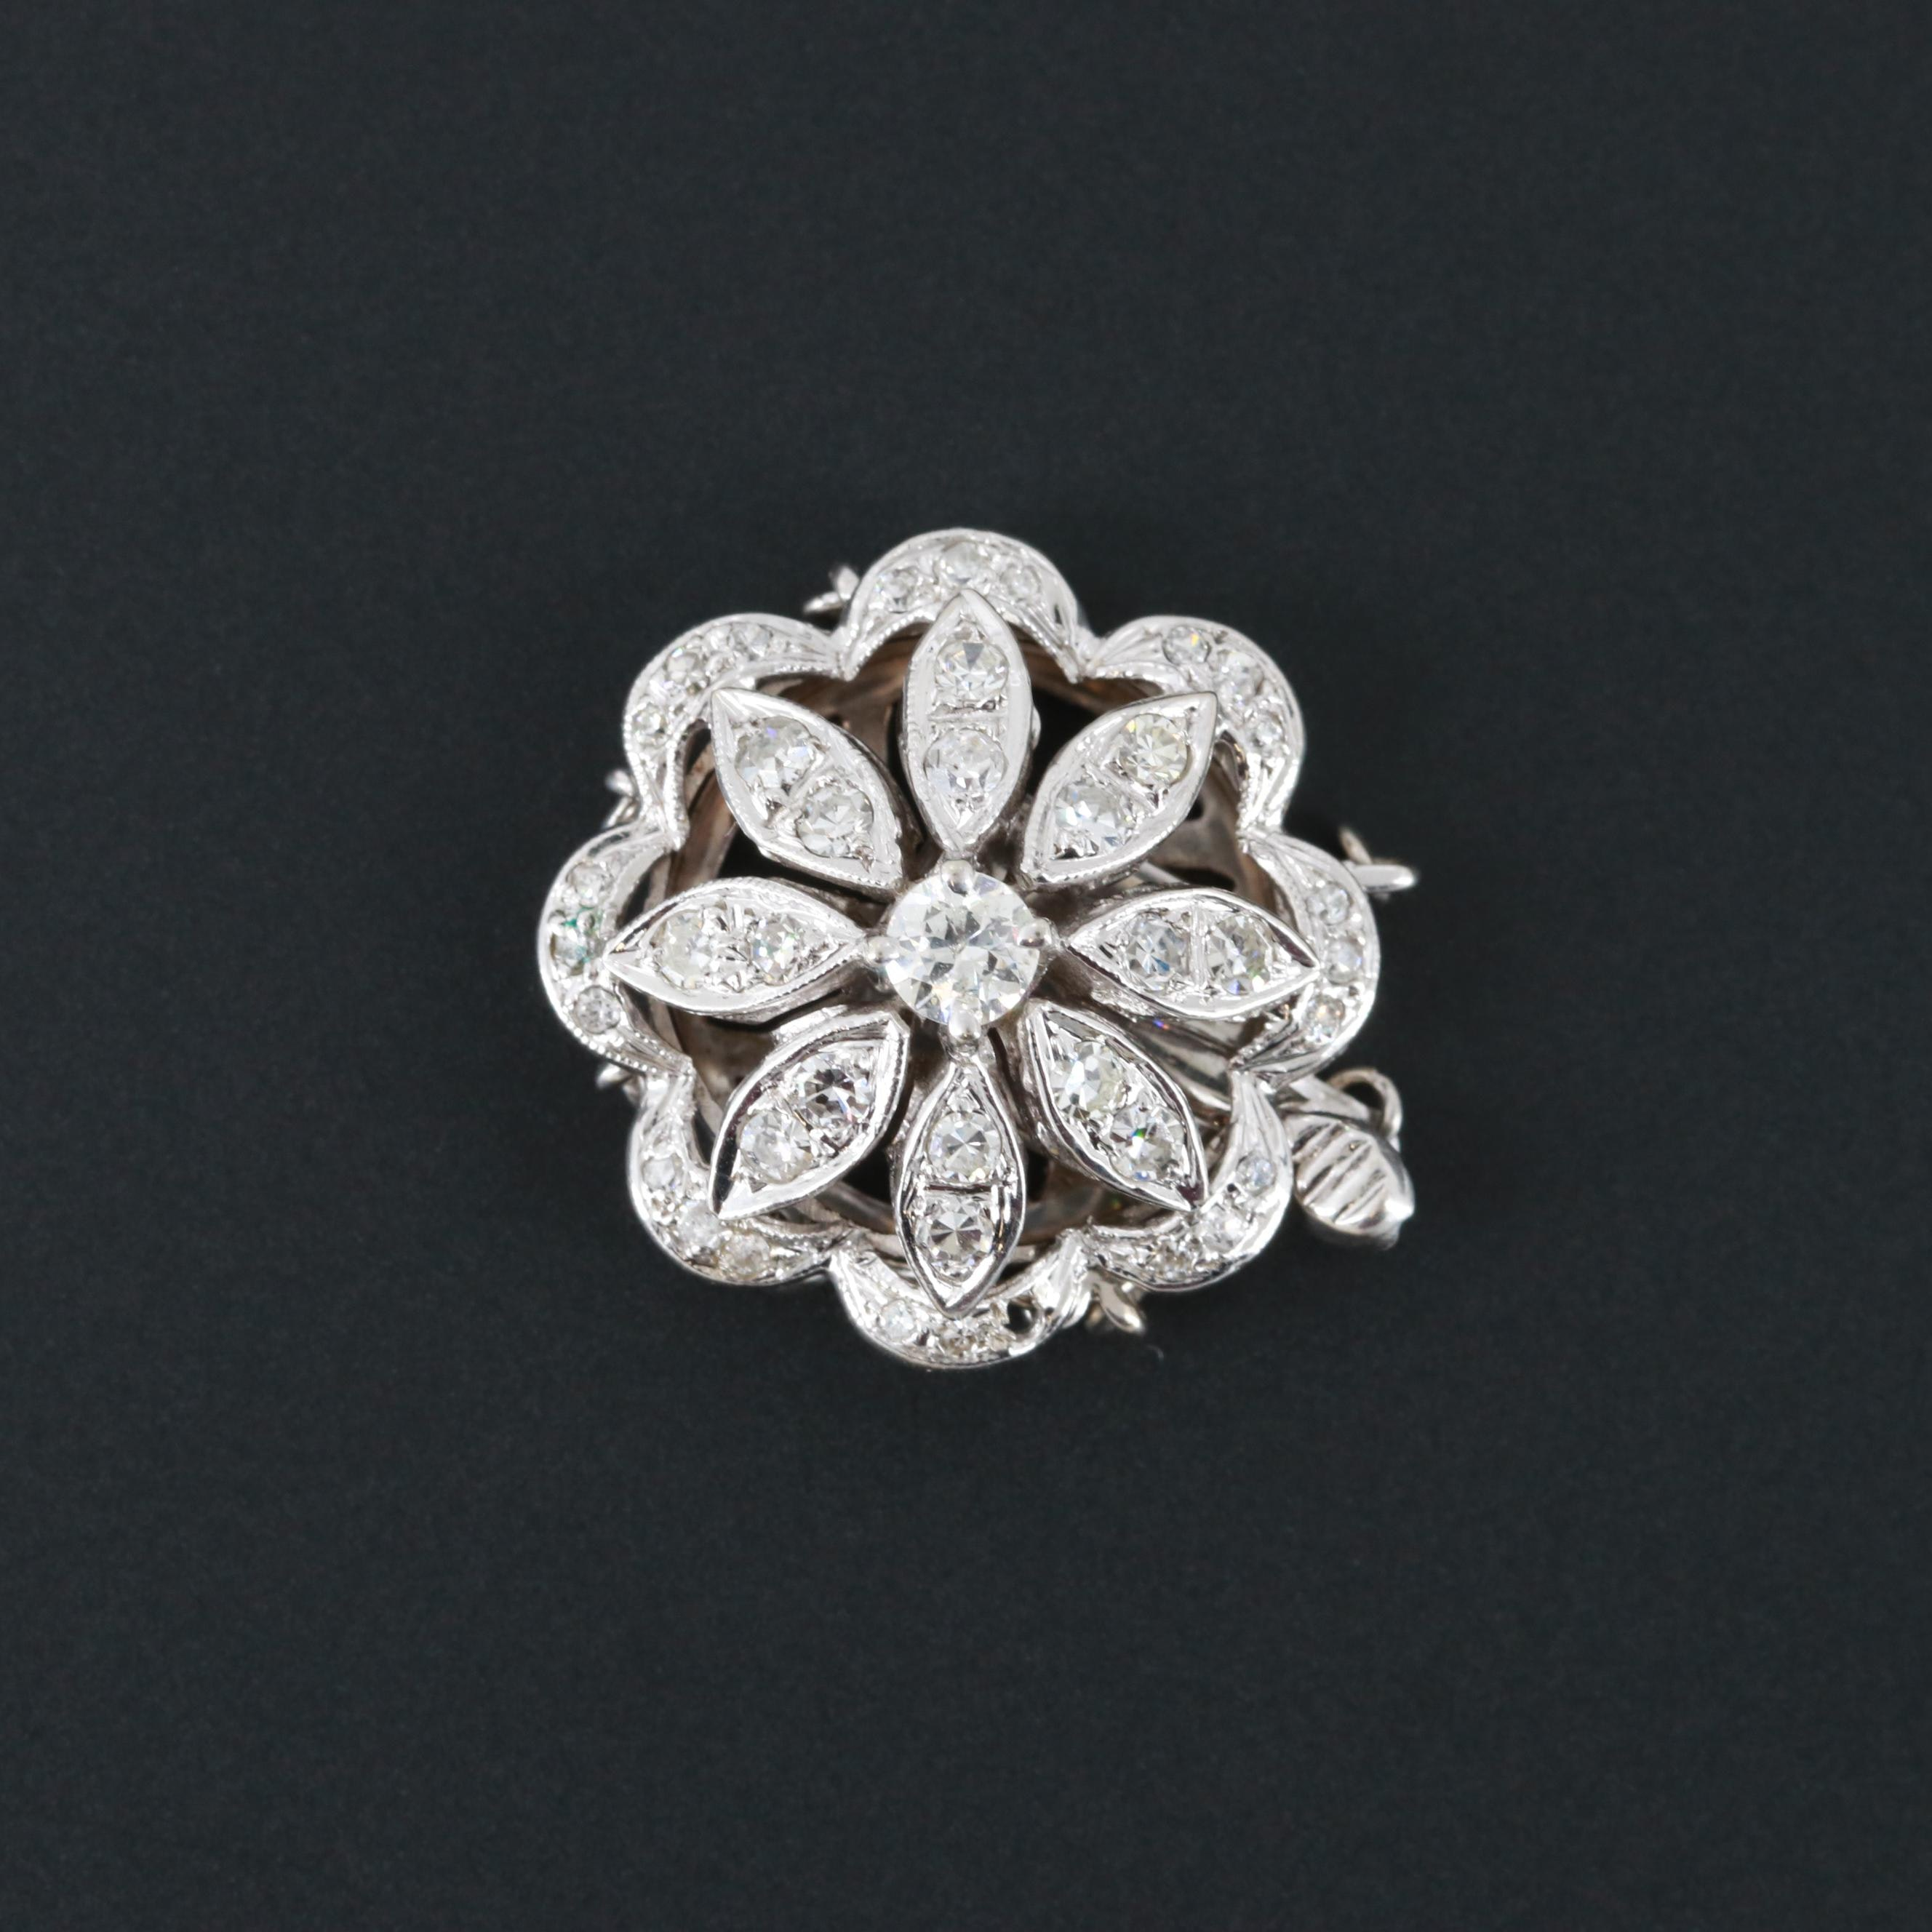 14K White Gold Triple-Strand Diamond Jewelry Clasp